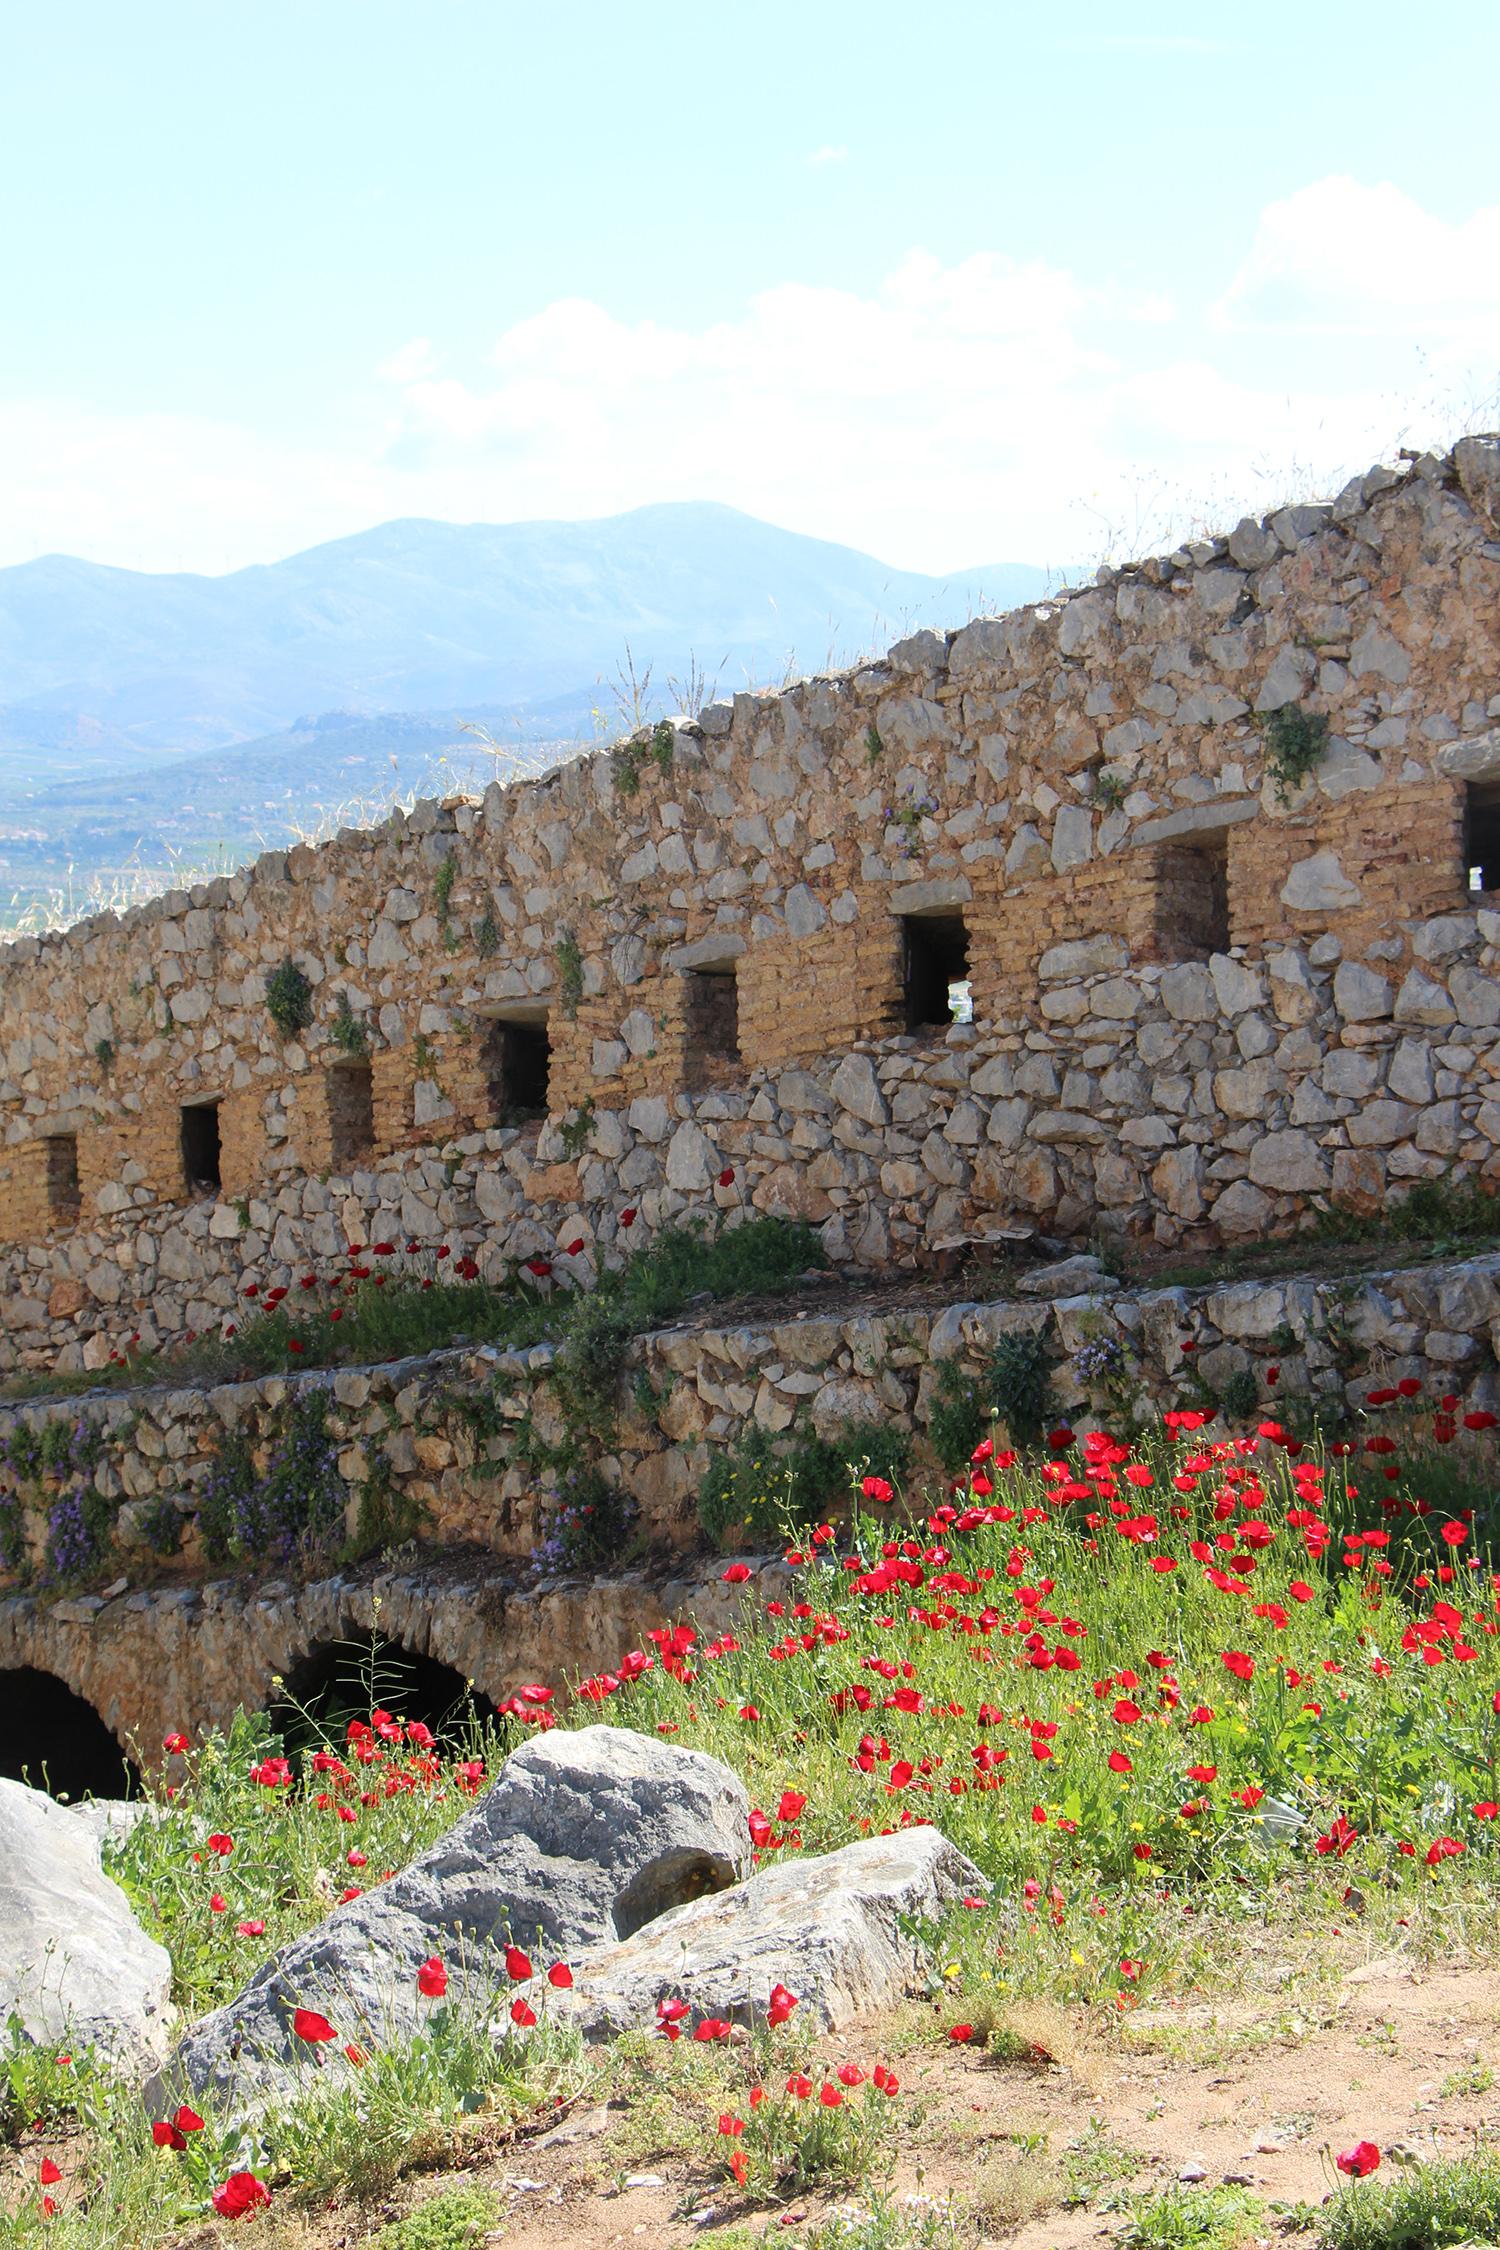 nafplio palamidi bastion poppies